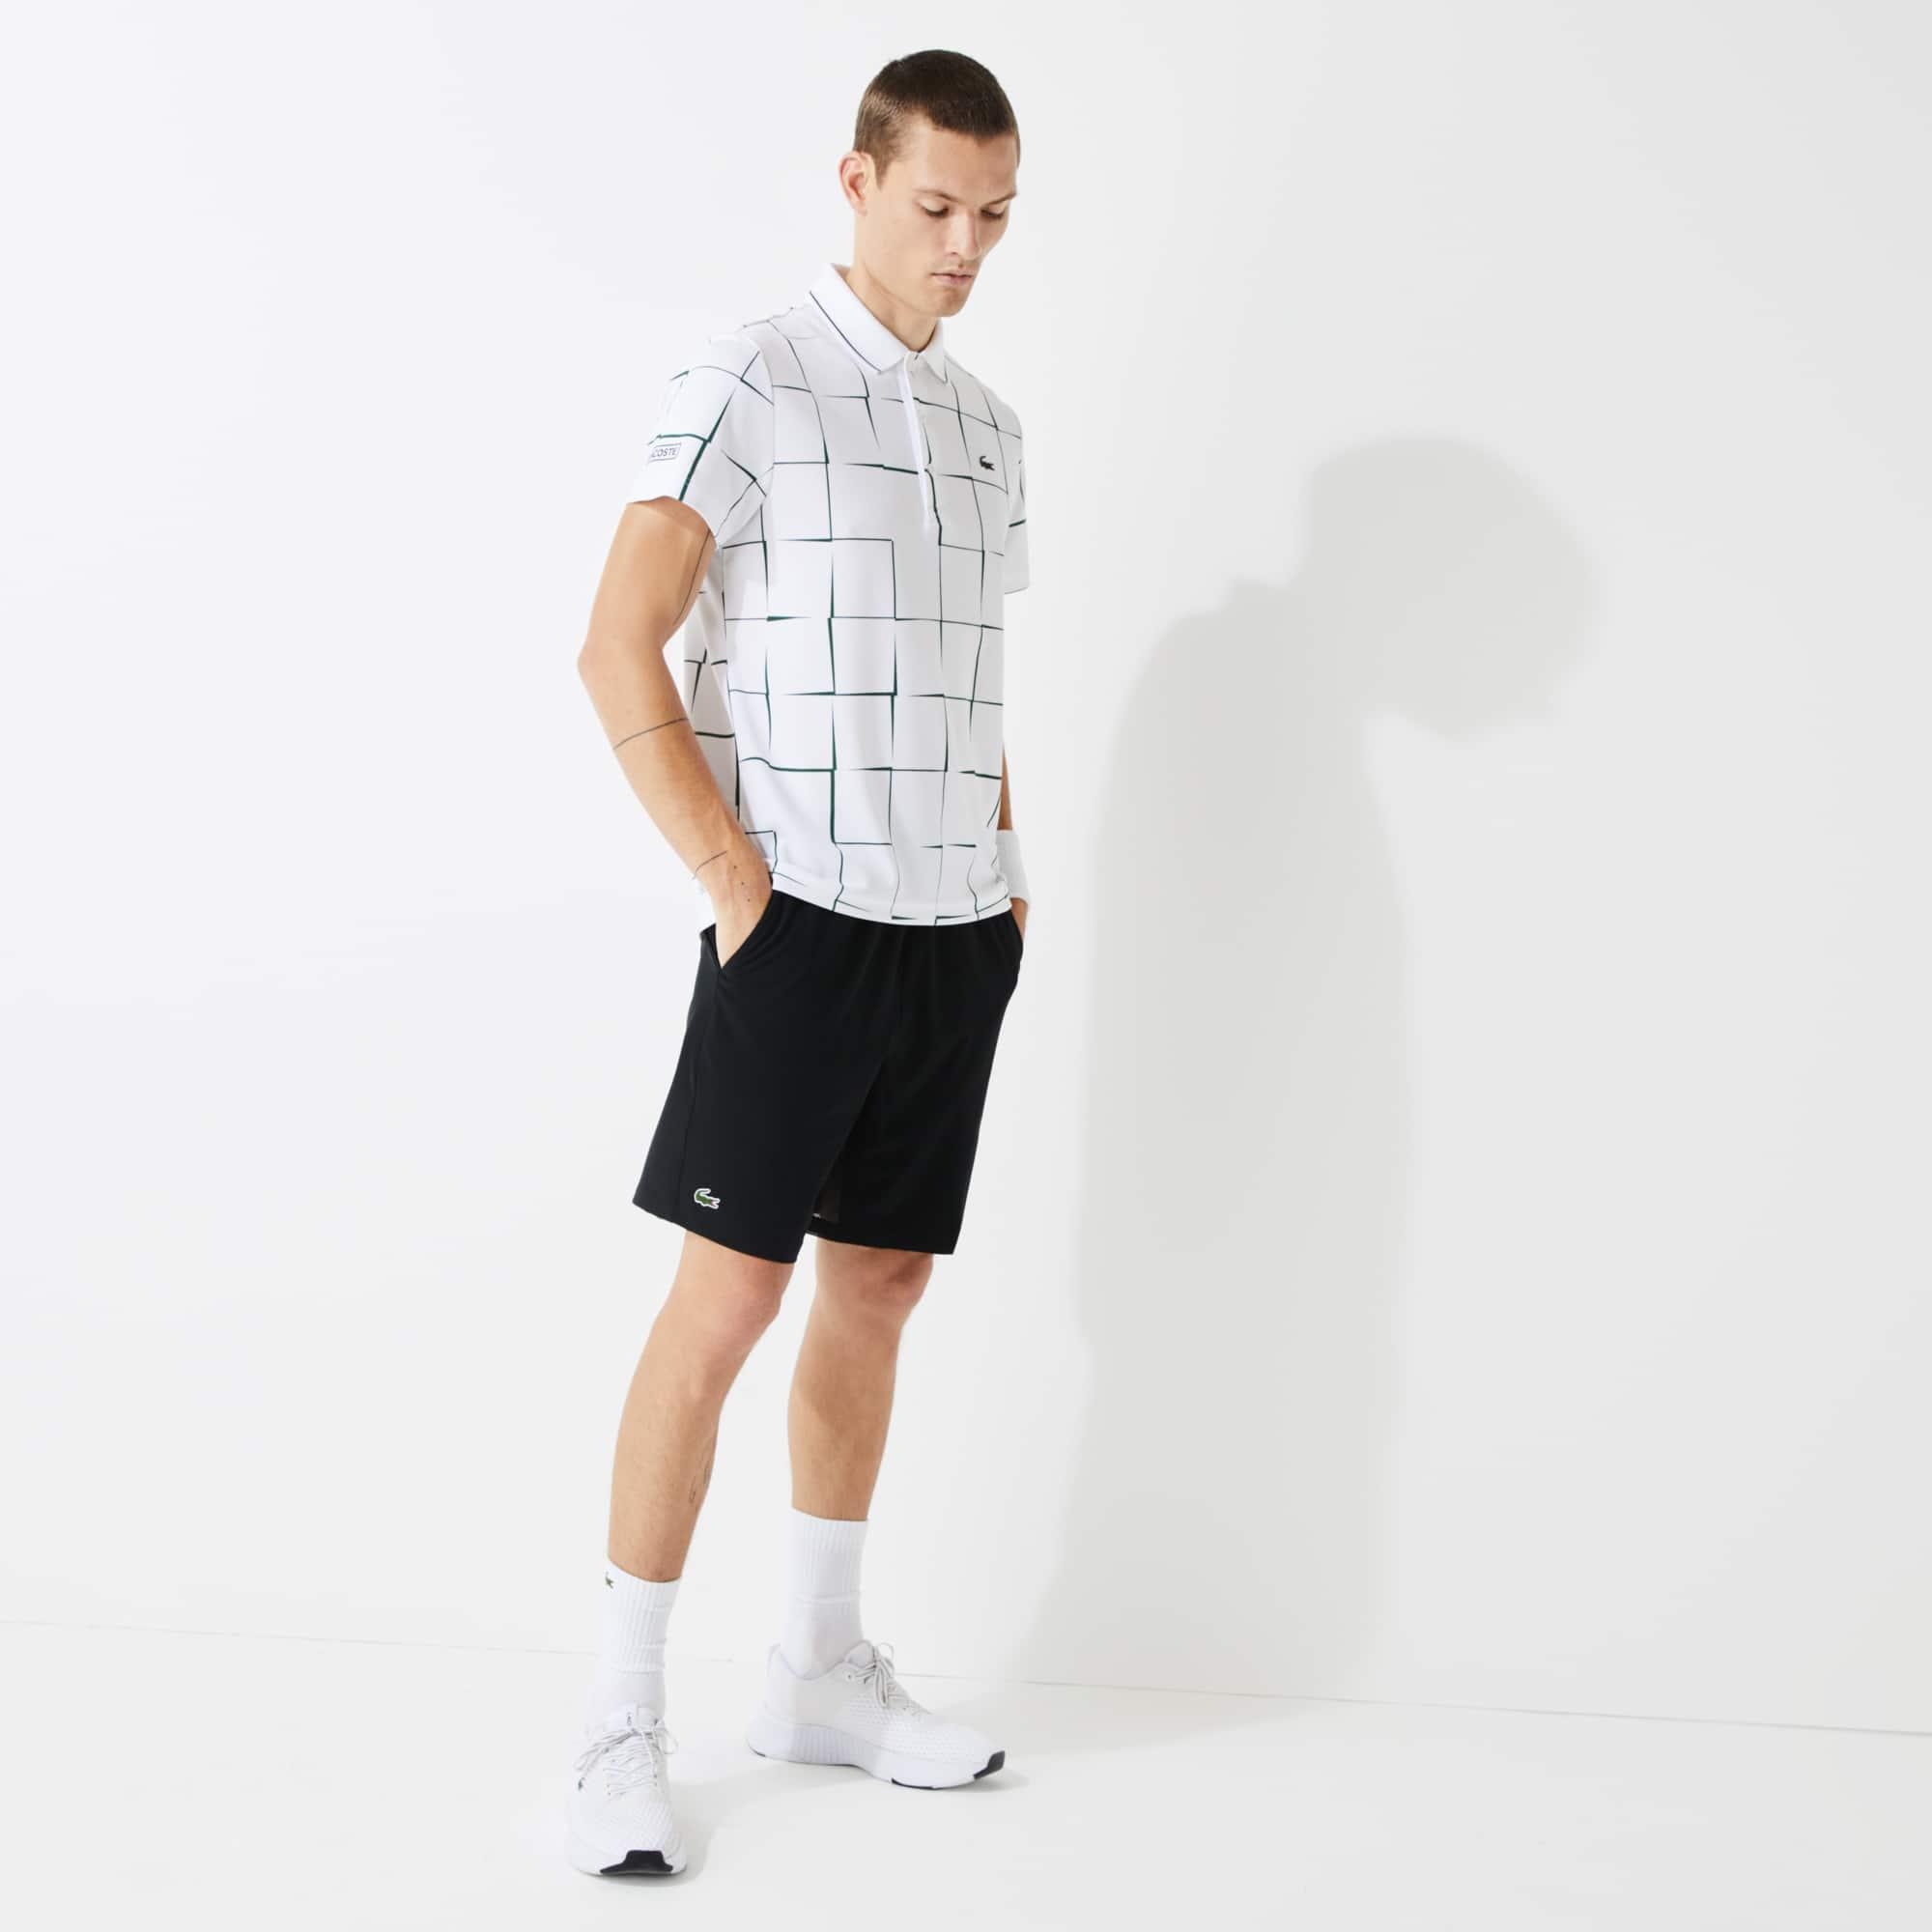 Lacoste Men's Sport Tennis Stretch Shorts In Black